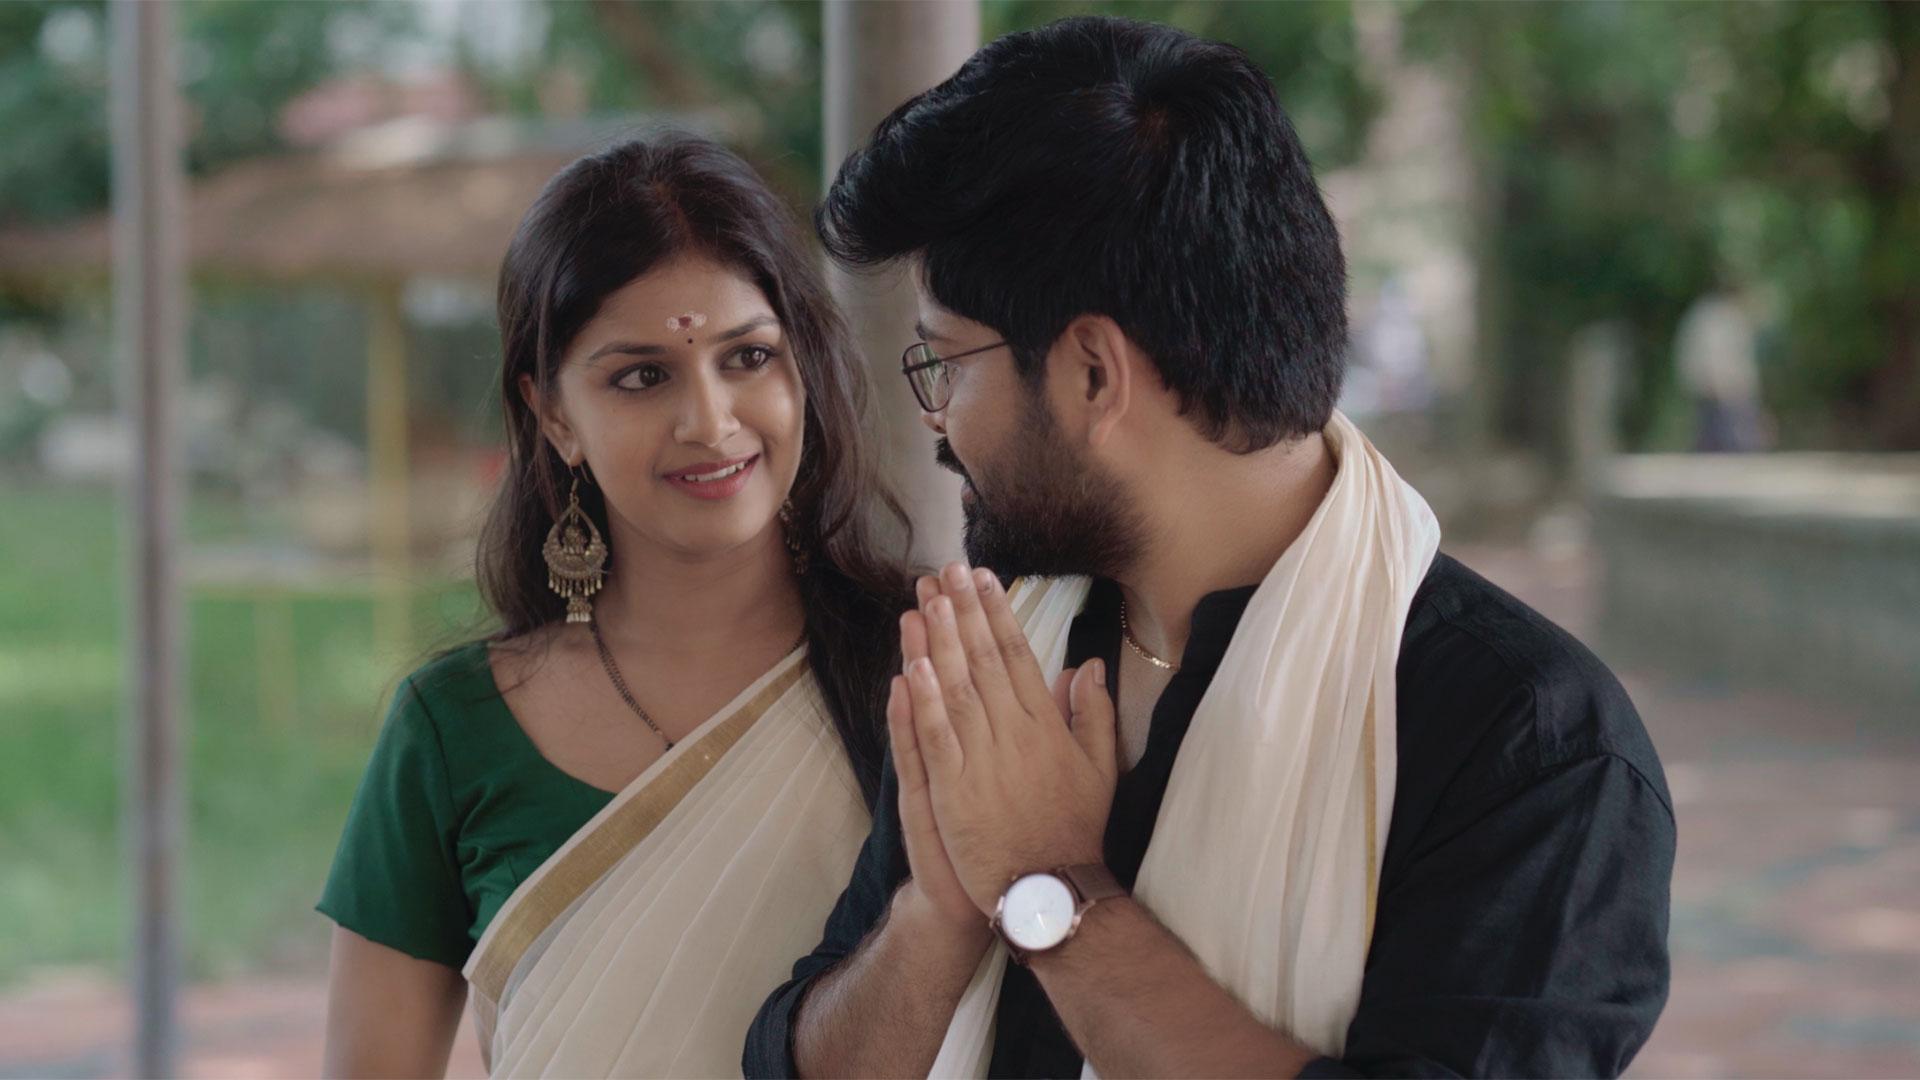 best web series to watch, best telugu web series in amazon prime, aha best movies, aha new web series list, best in aha app, aha telugu web series list, locked web series, aha app web series list, Telugu Web Series on AHA